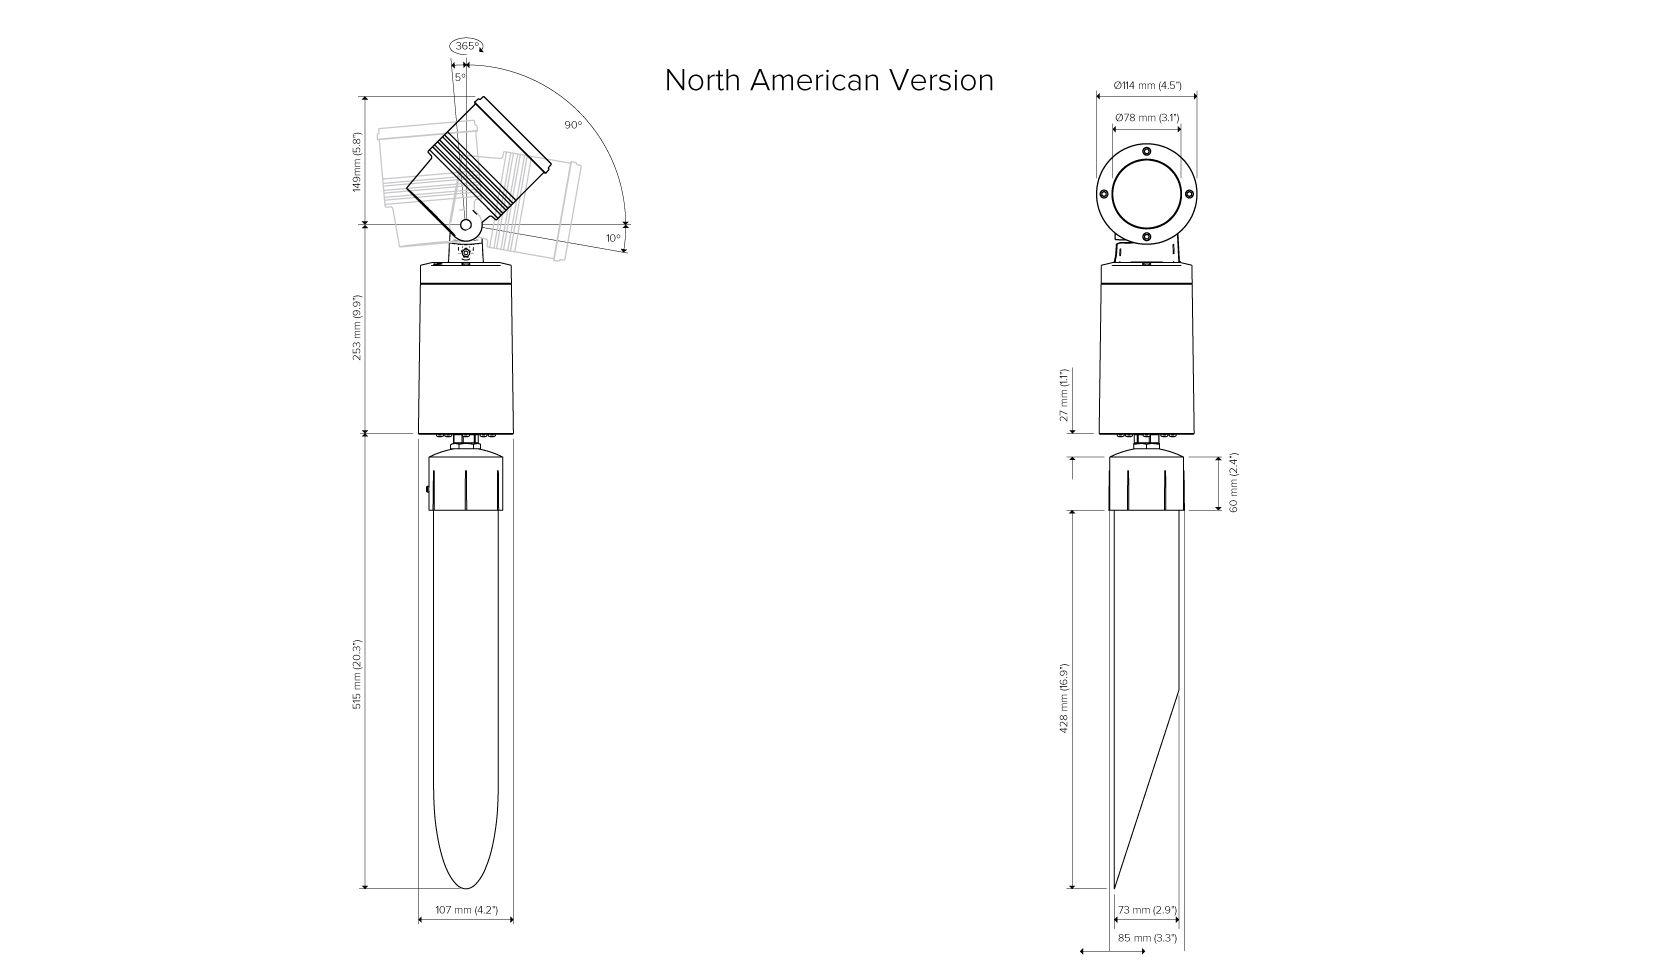 Ls2010 Stena Spike Mount Spotlight Lumascape Rgbw 010v Led Dimmer Controller Sr2811110v Specifications